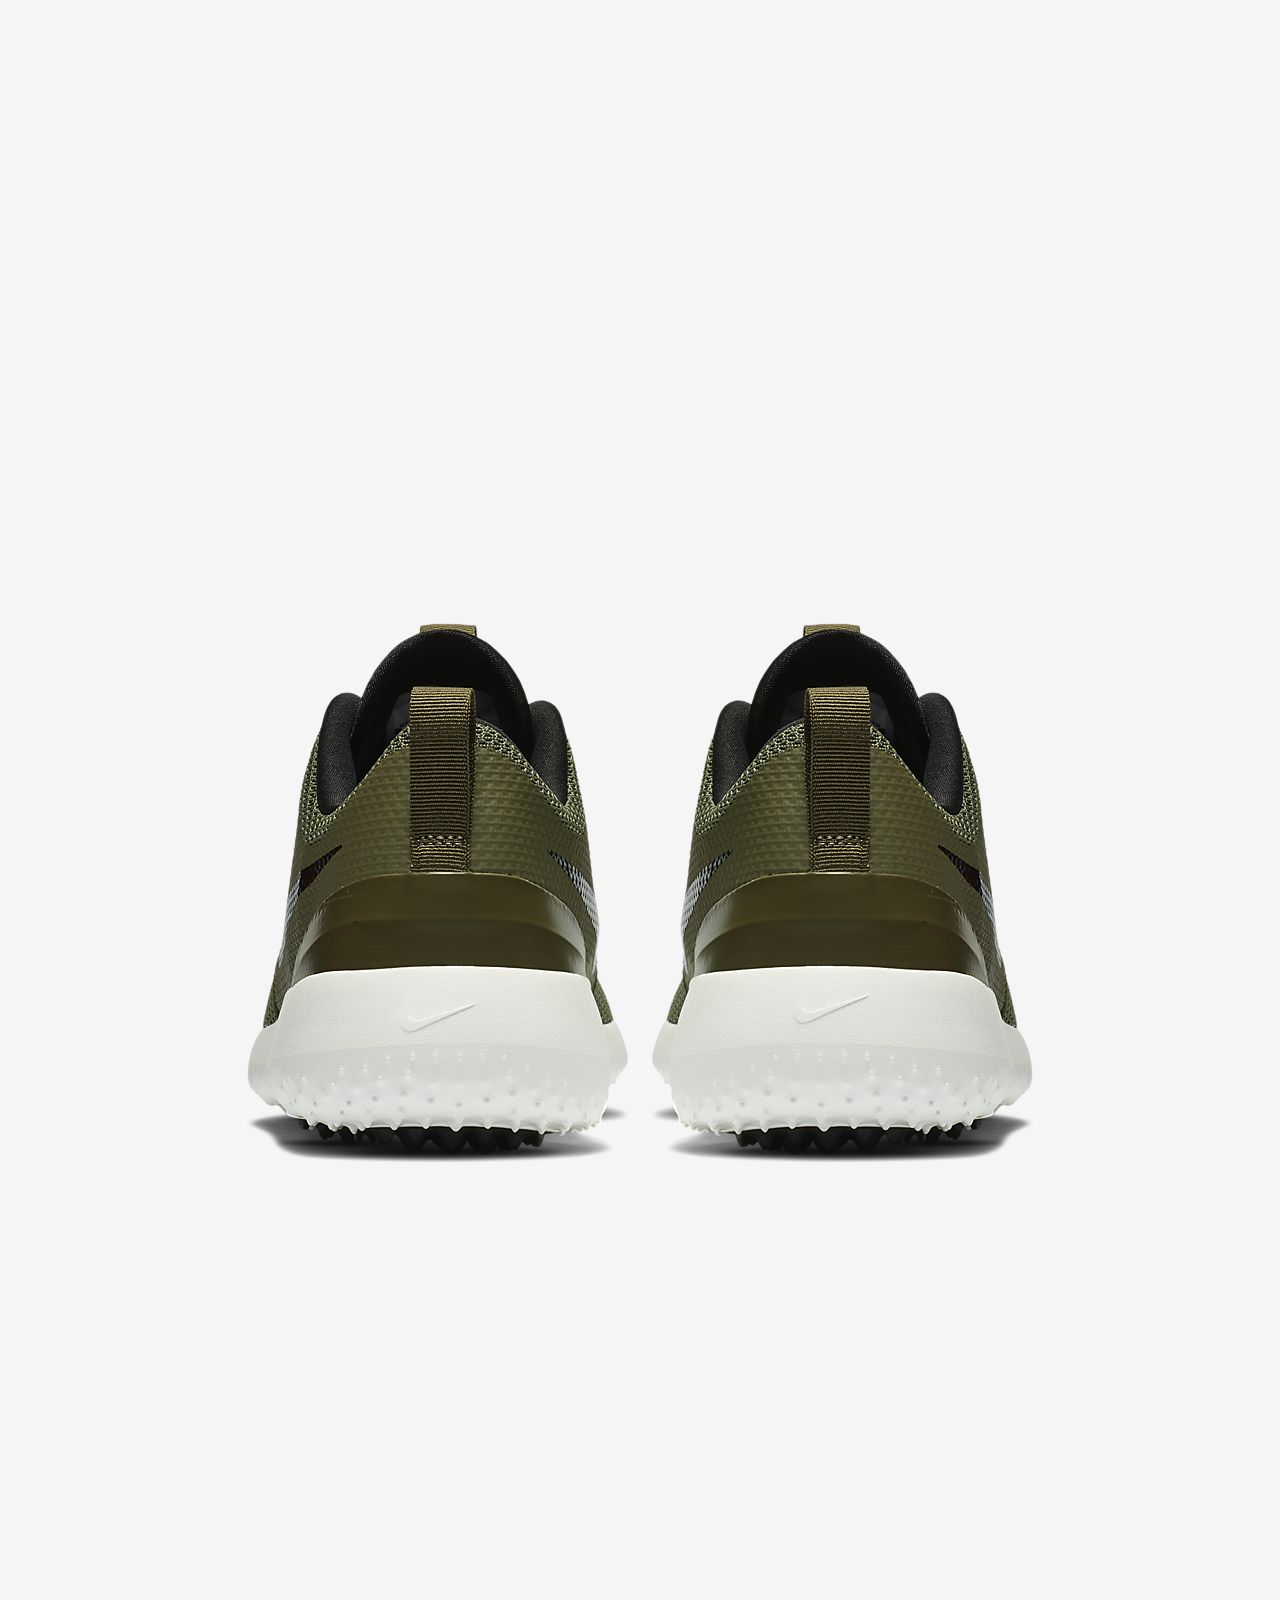 best website abdc9 9141b ... Chaussure de golf Nike Roshe G pour Homme